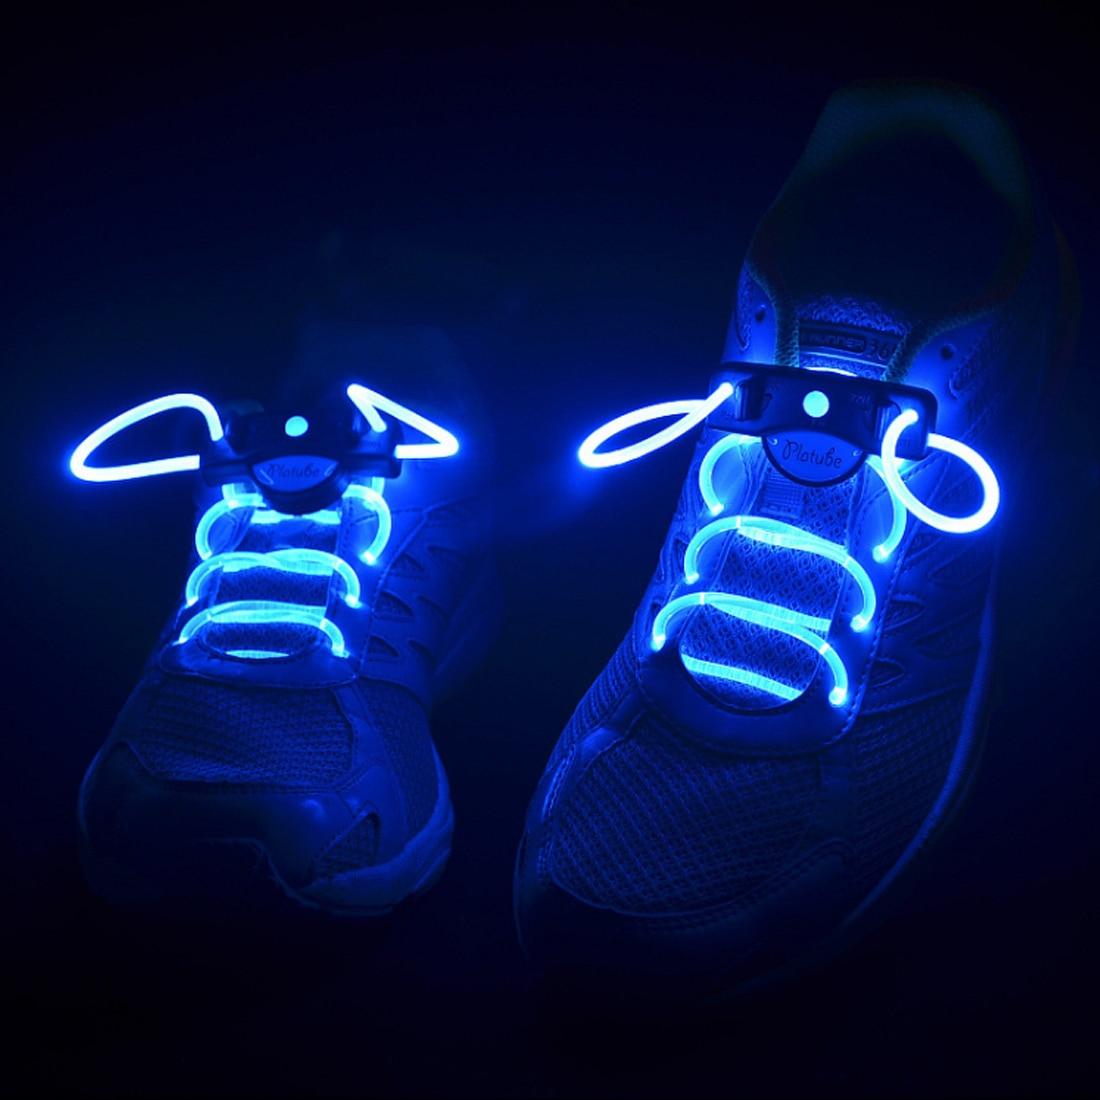 Hot! 2pcs! Fashion LED Shoelaces Shoe Laces Flashing Light Up Glow Stick Strap Neon Shoe Strings Luminous Laces Disco Party